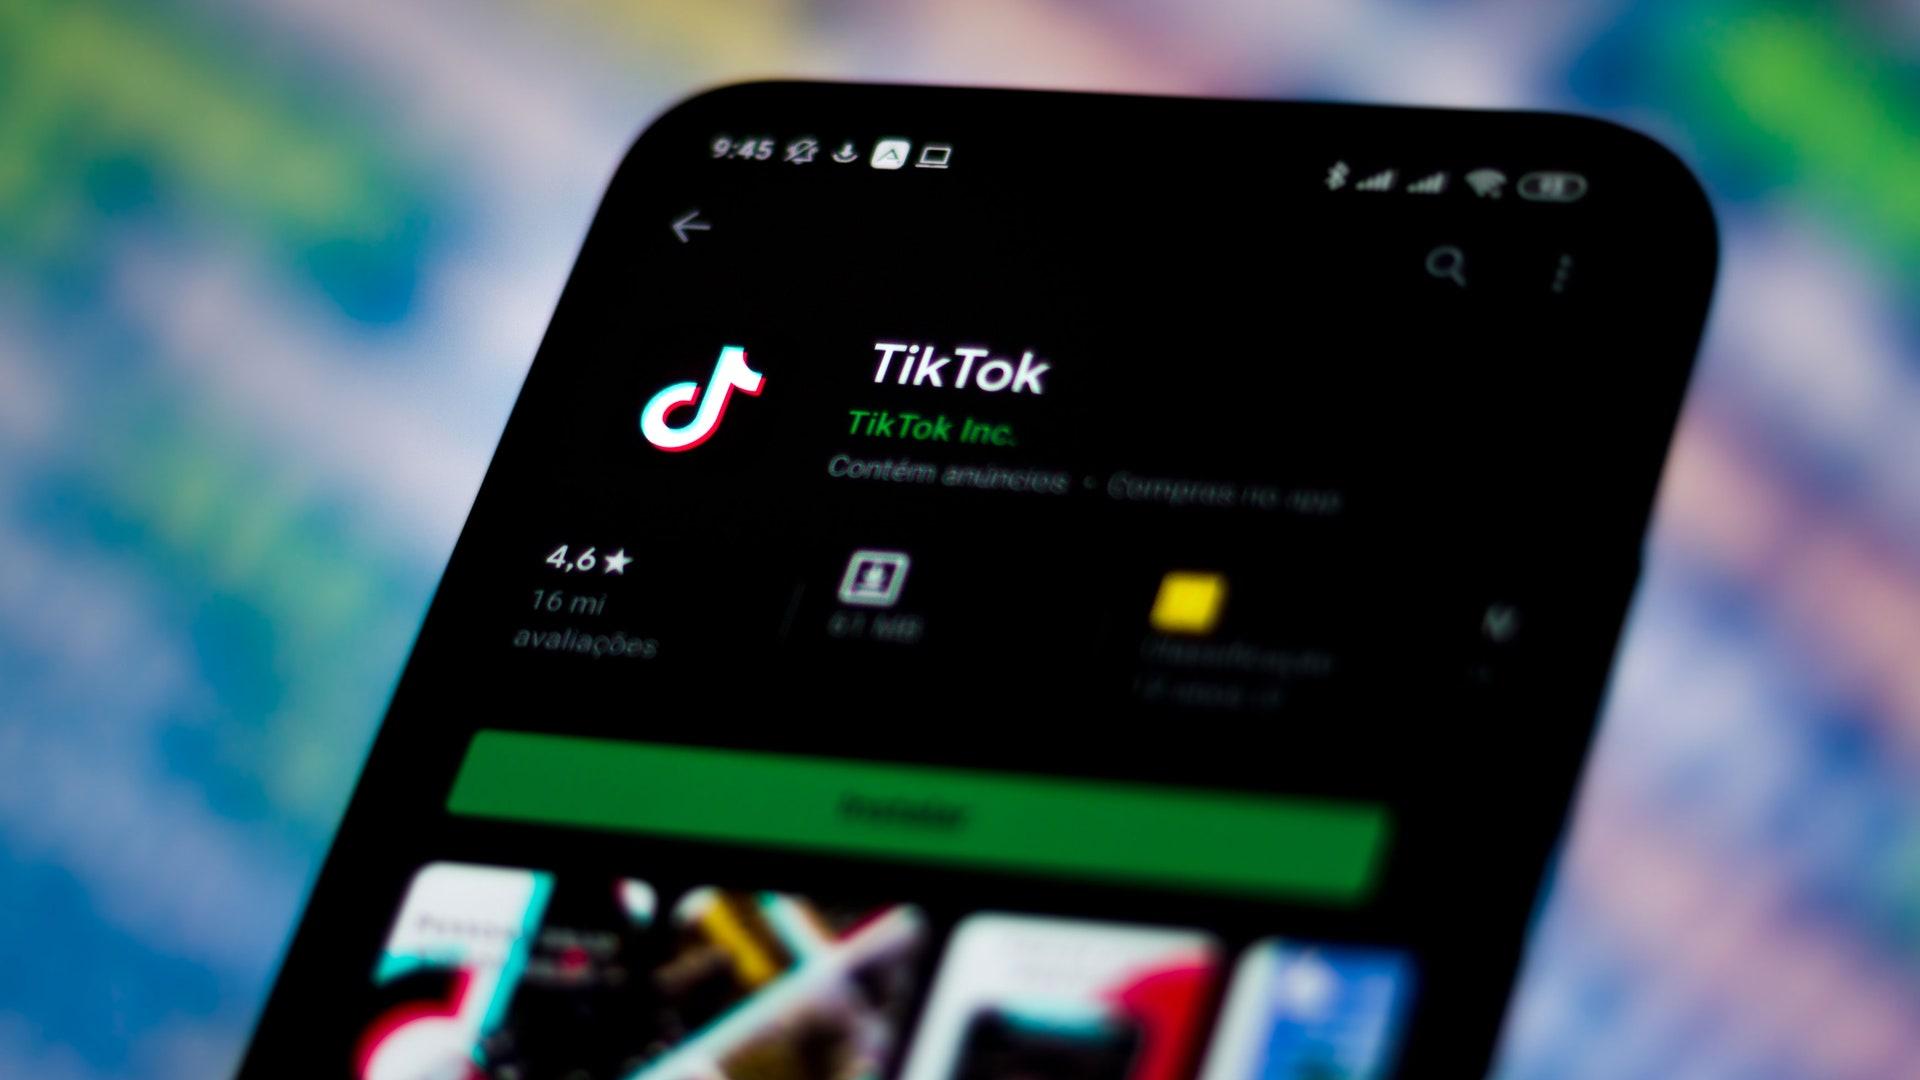 TikTok Android